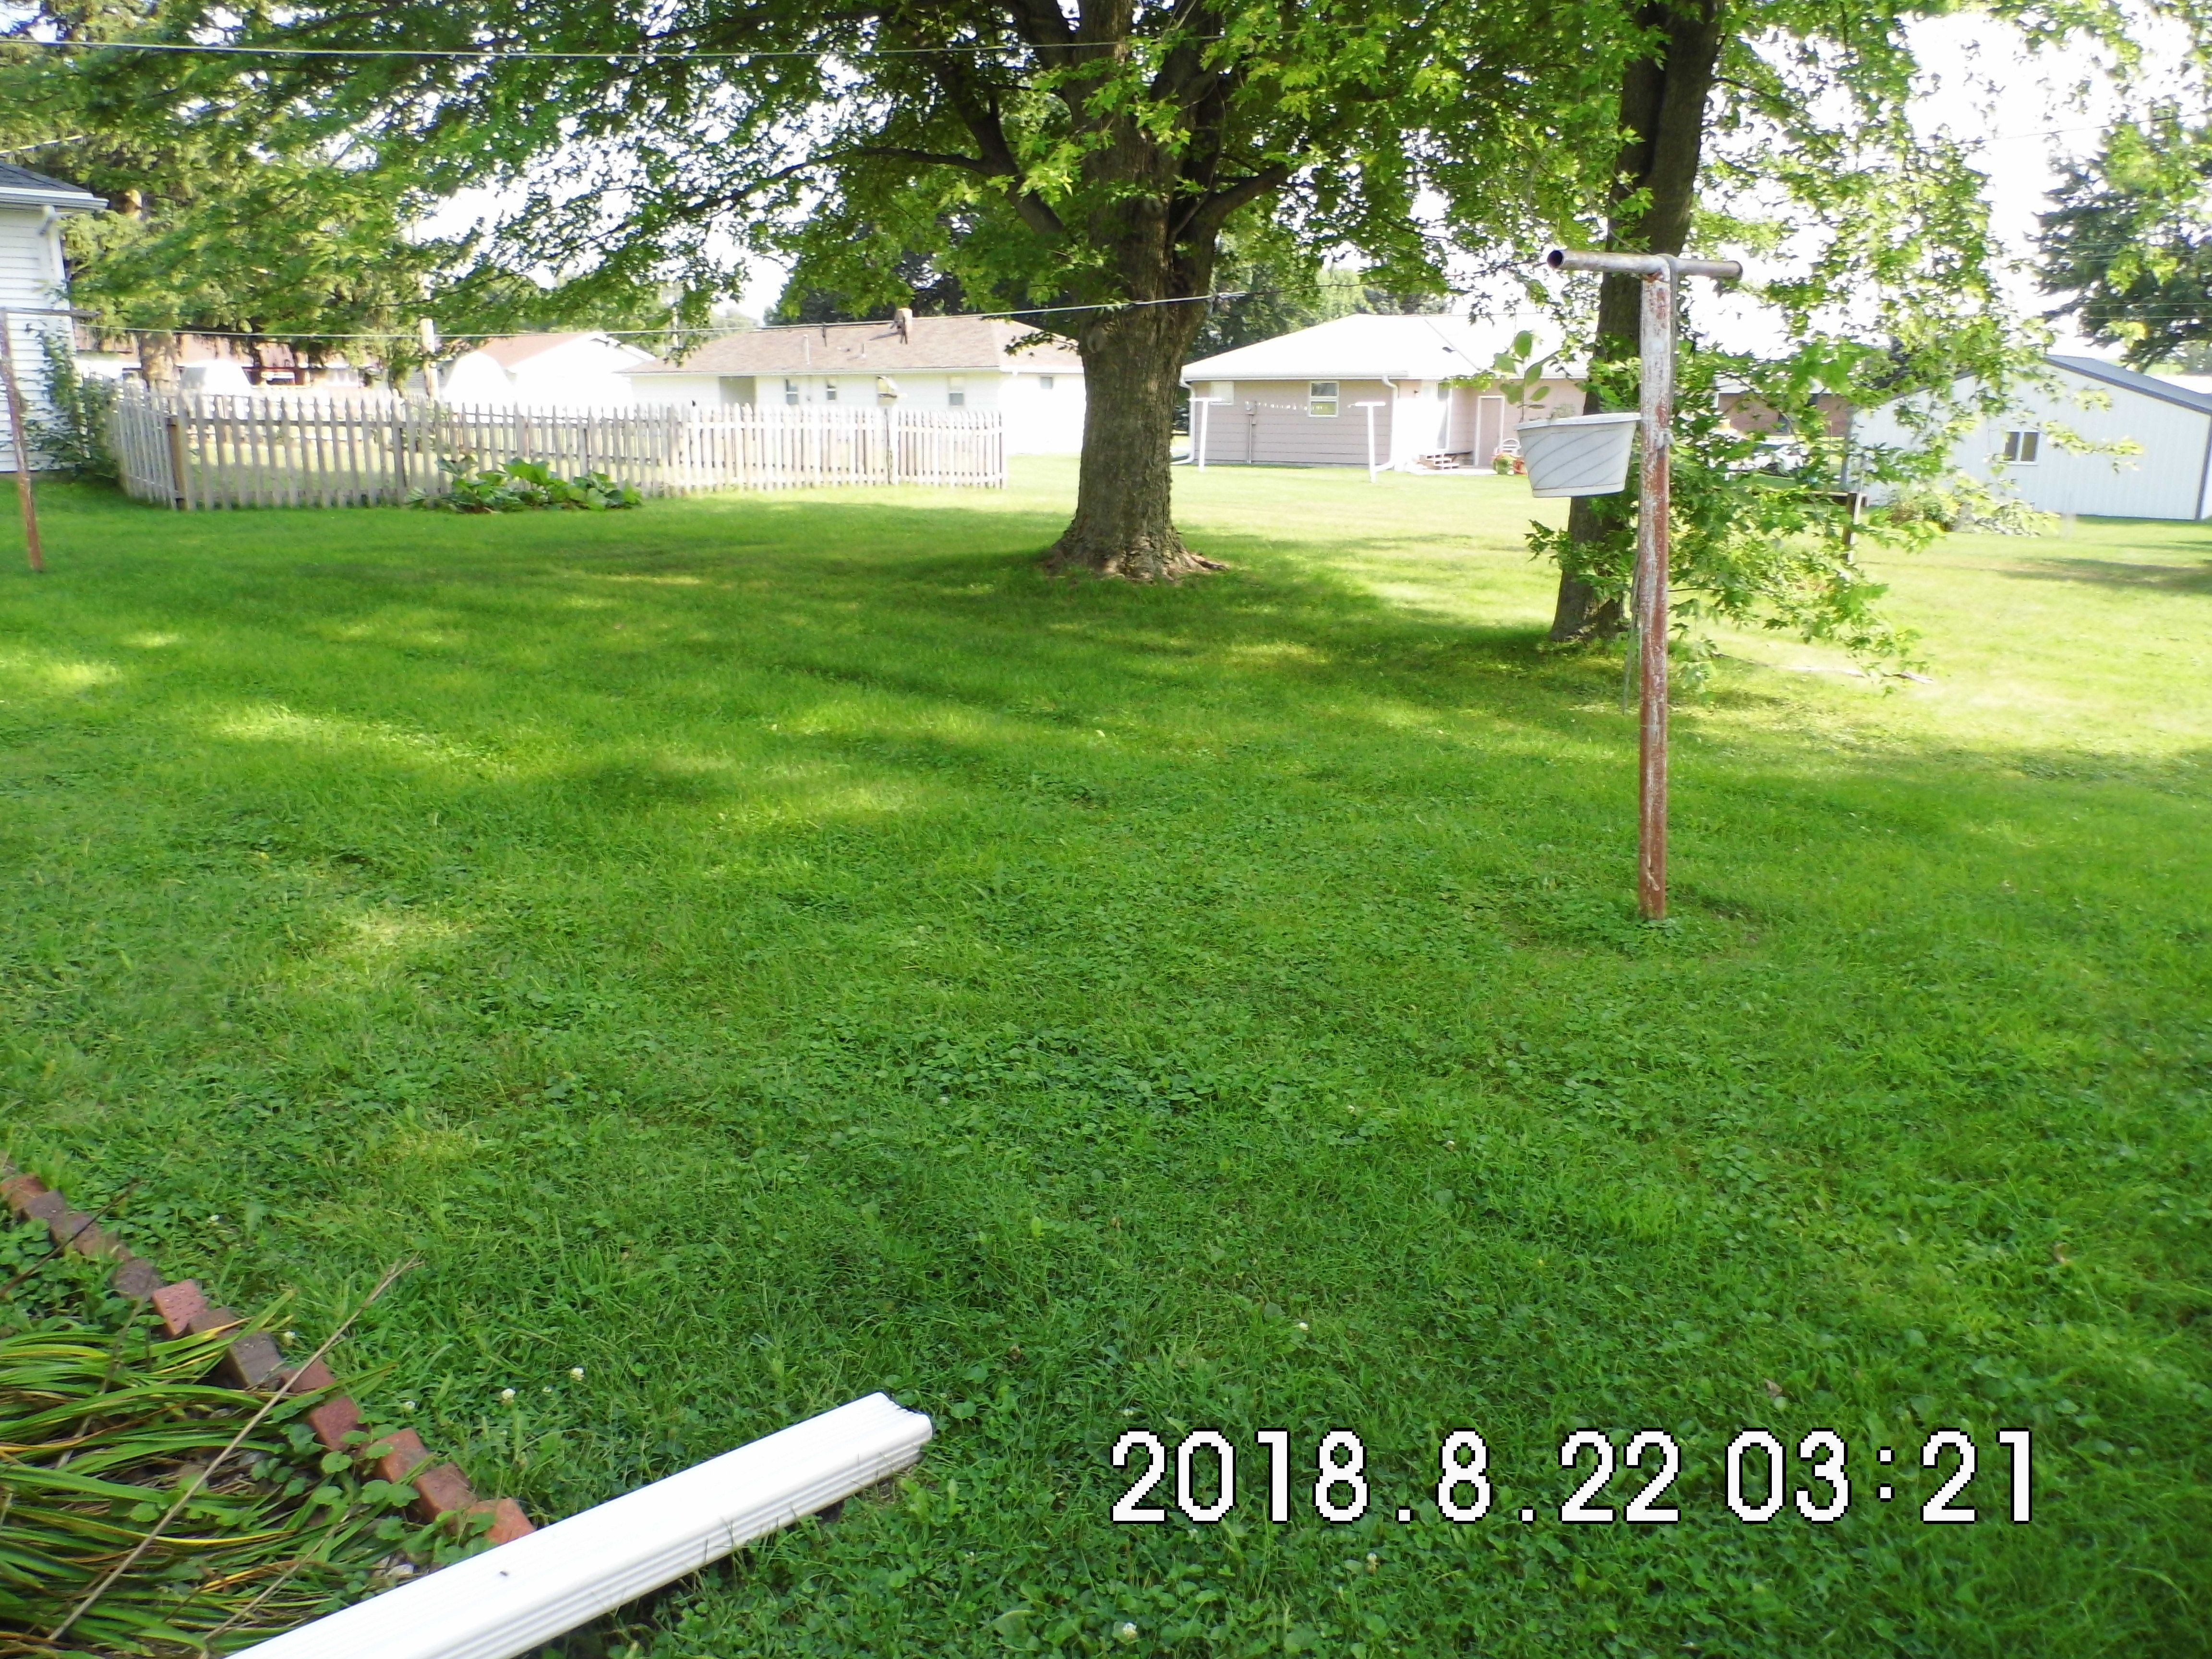 2.1 303 Elm St. Back yard